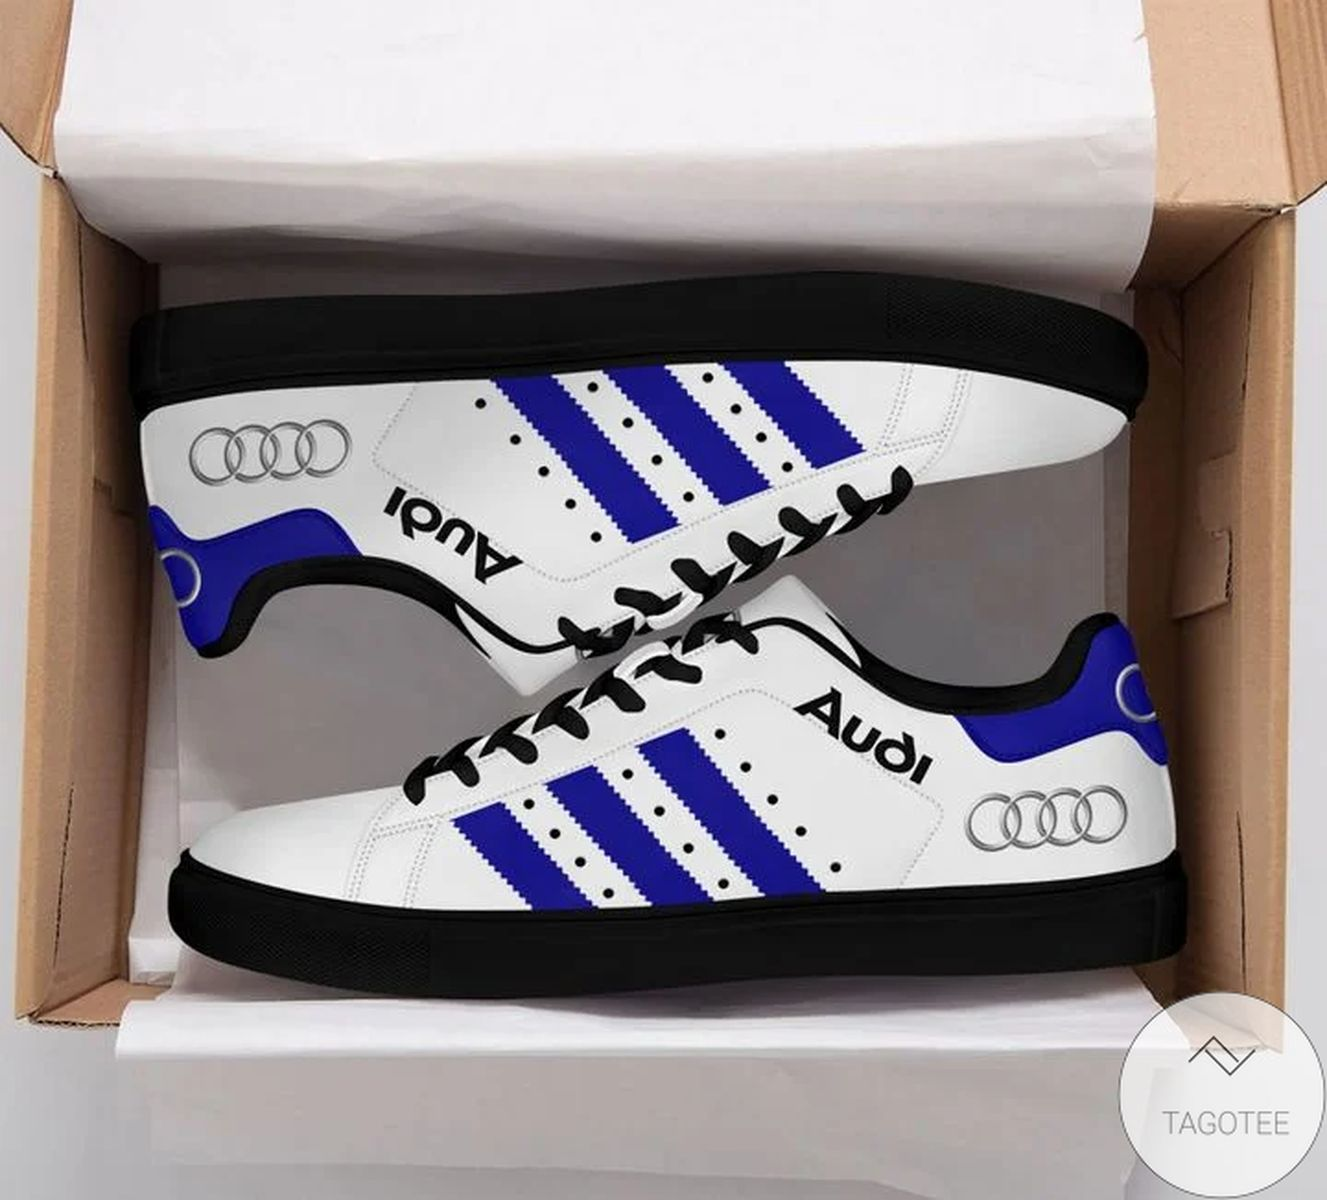 Hot Deal Audi Tt Stan Smith Shoes